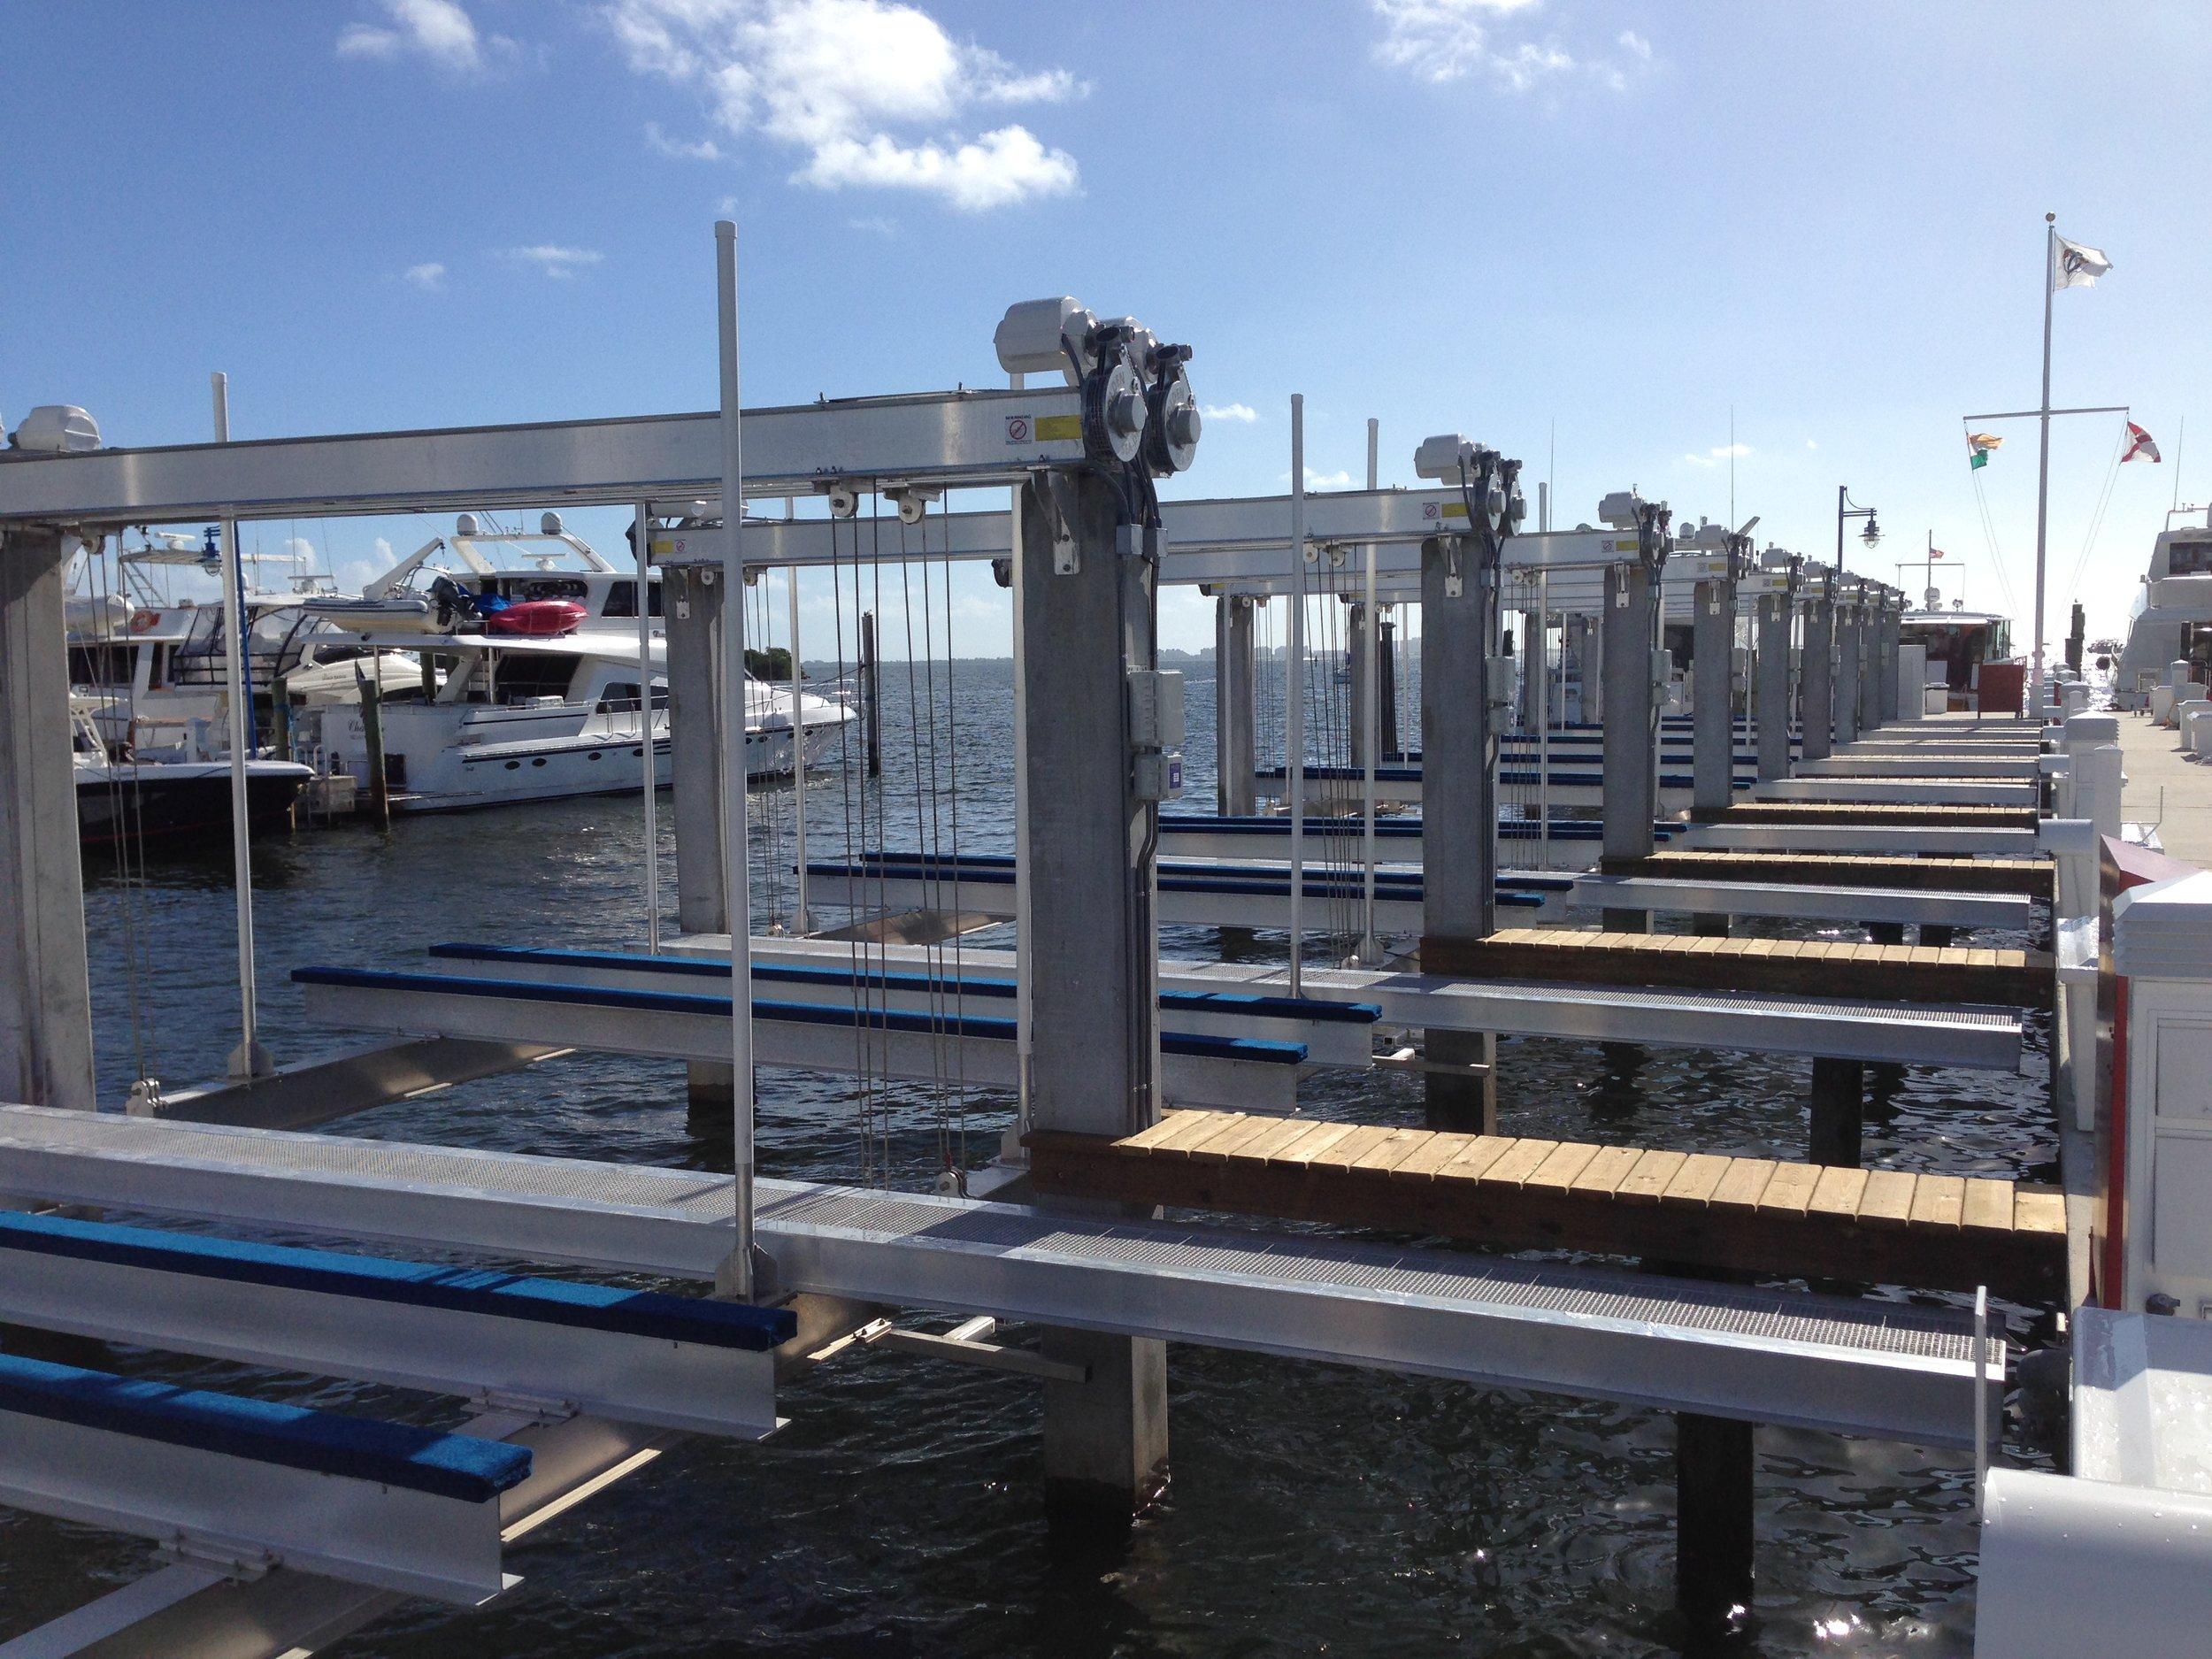 Marina bootlift, boat lift, boathouse lift, bootlift, boot lift, boatlifting systems, 4-post, bootslift, schiffshebewerk, bådehus lift, båd elevatorer, båd lift, elevador marítimo, boatlift